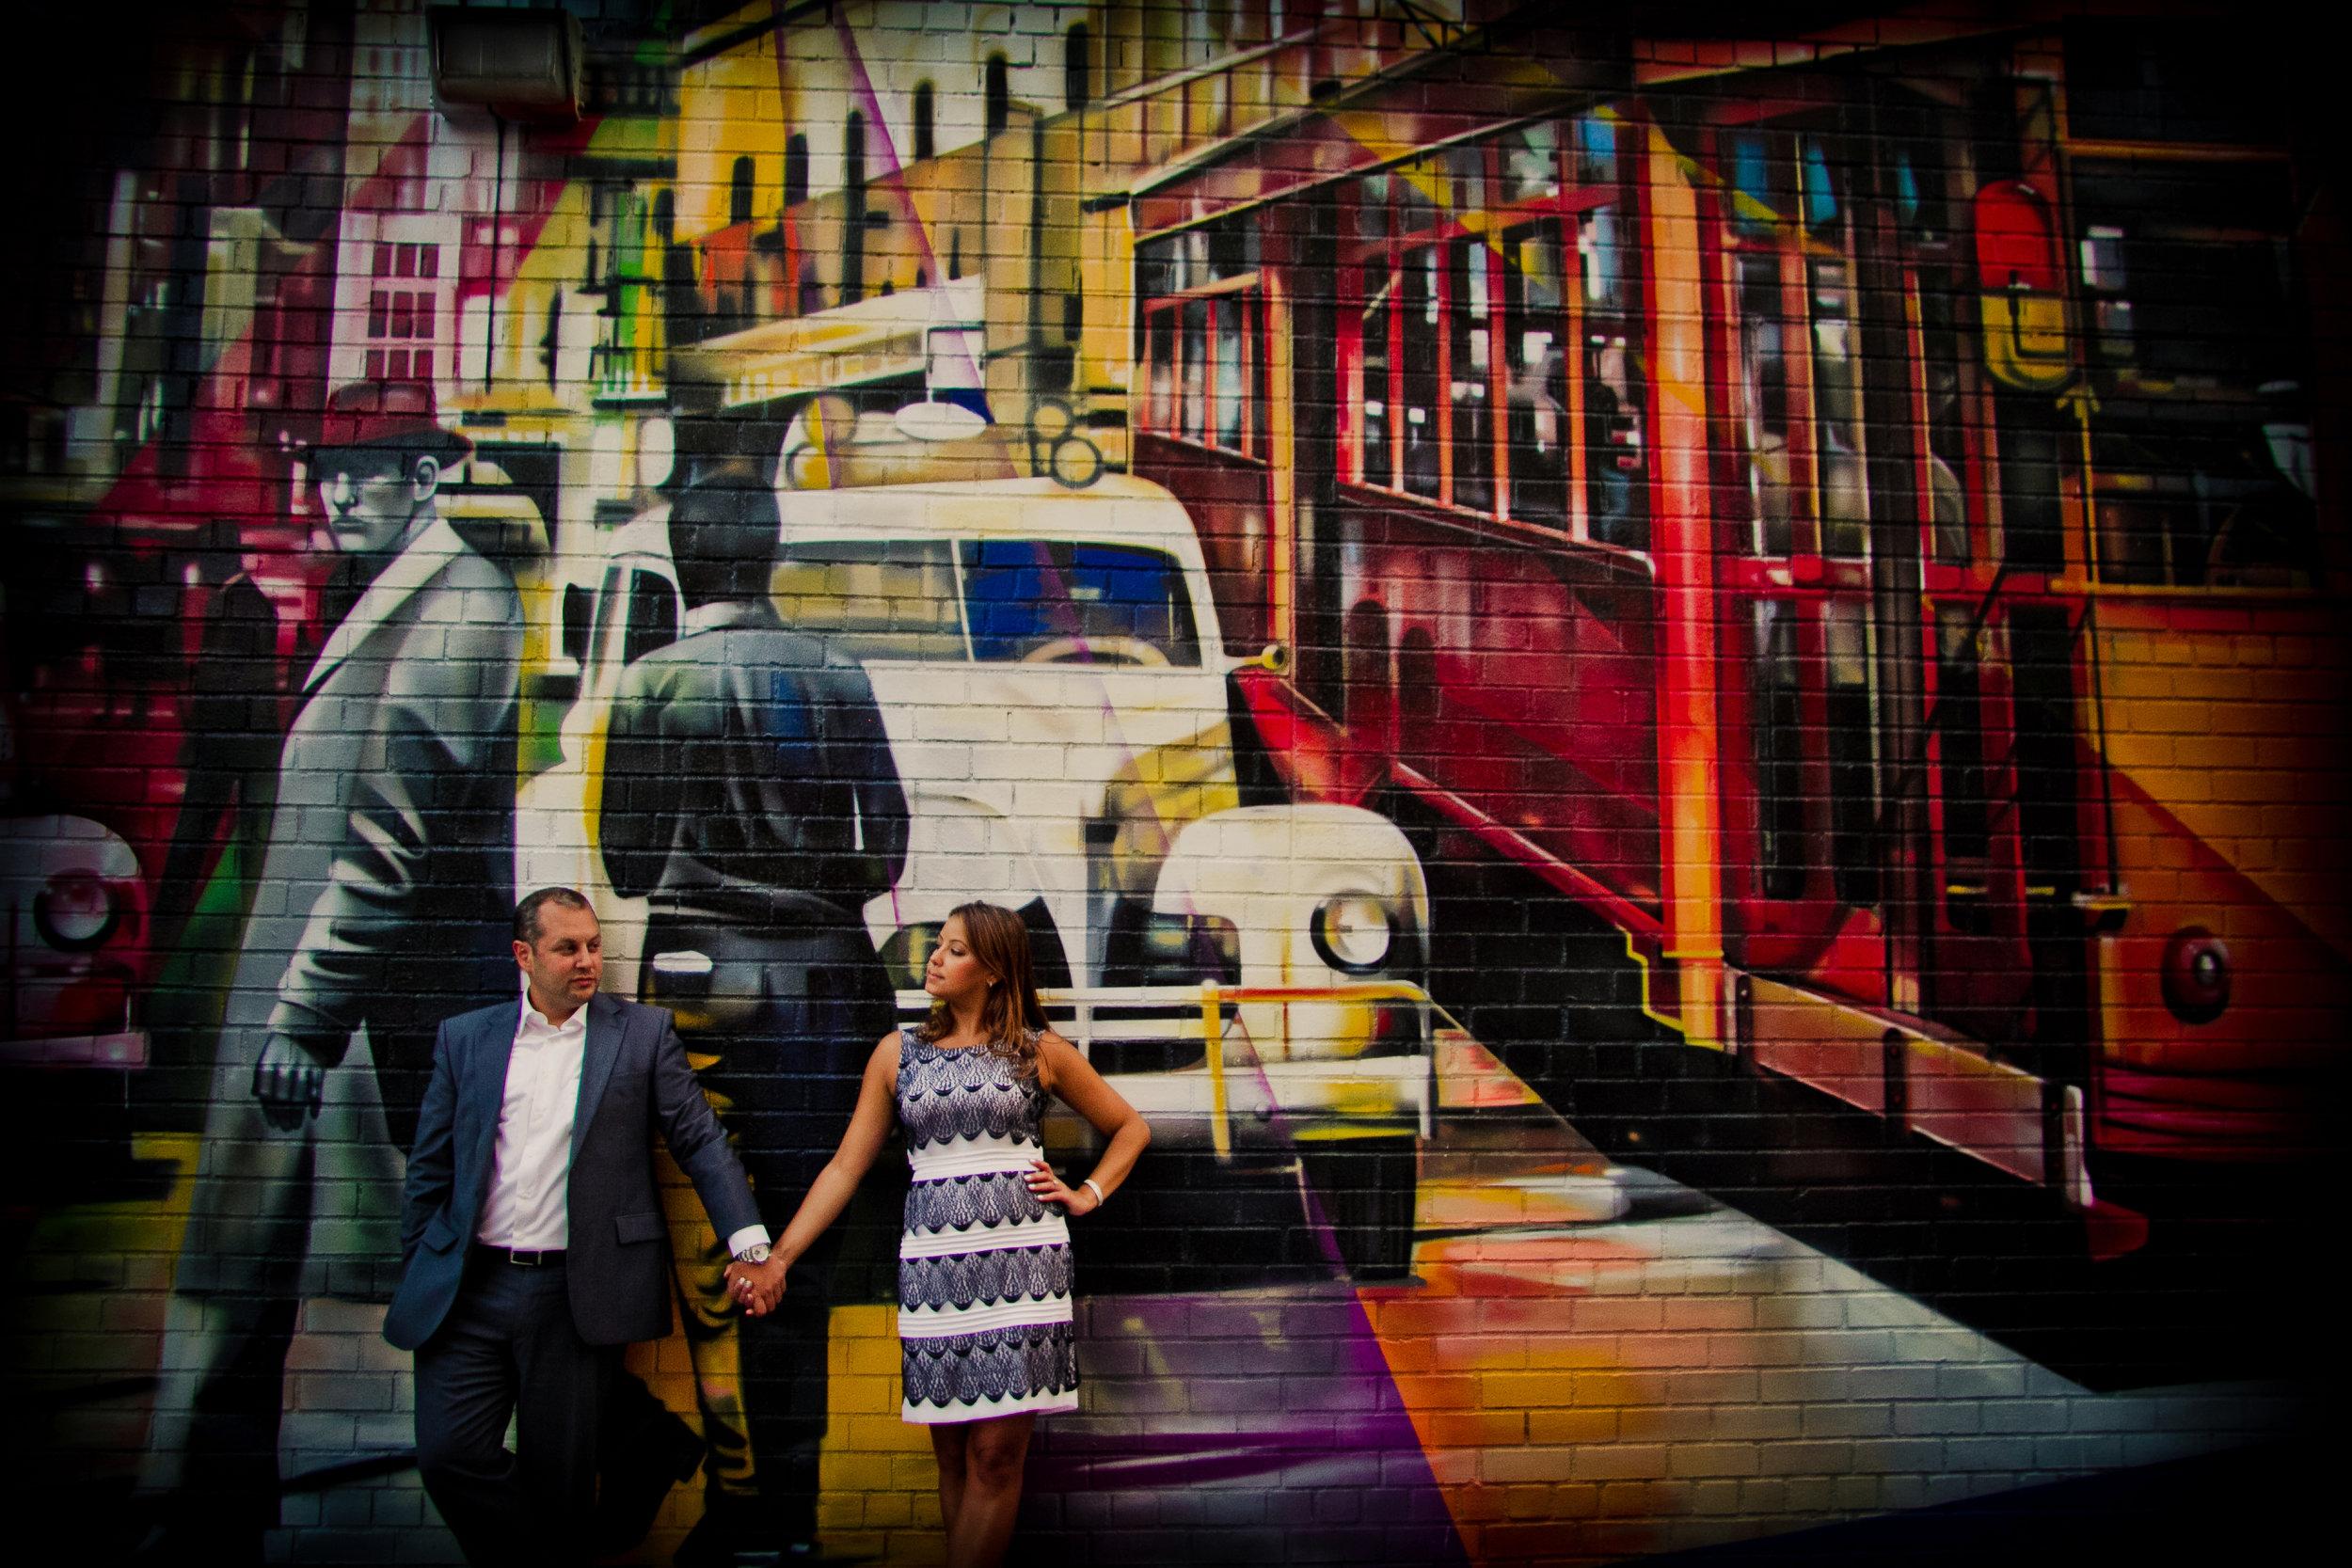 new-york-city-engagement-15.jpg